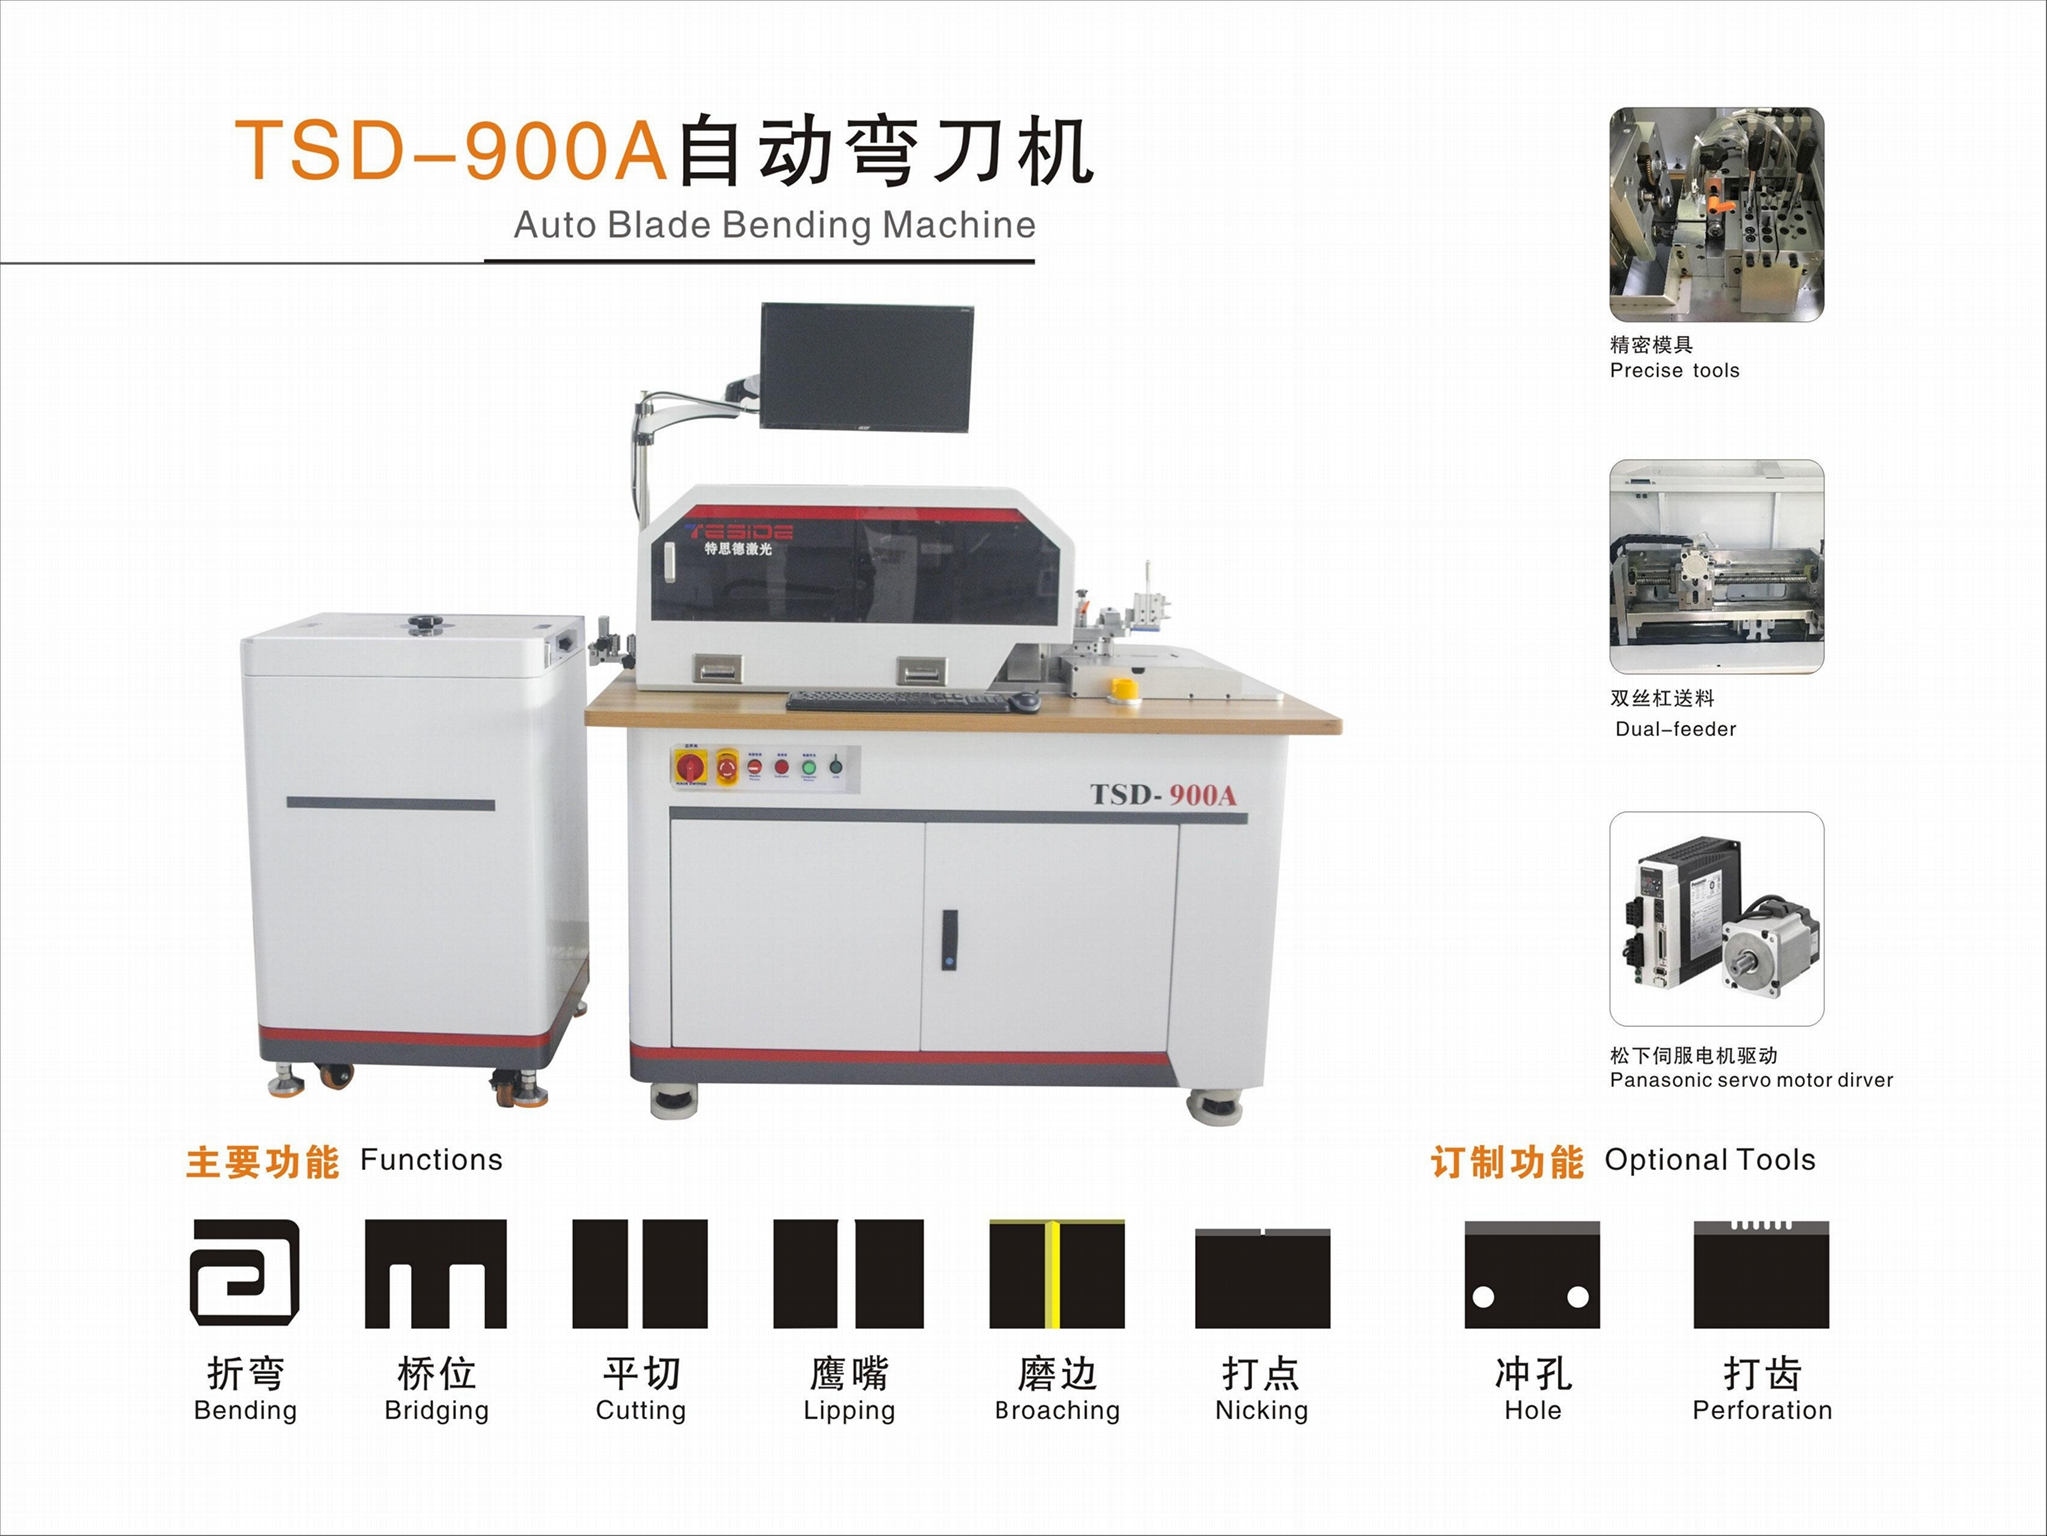 TSD-900A自动弯刀机 2